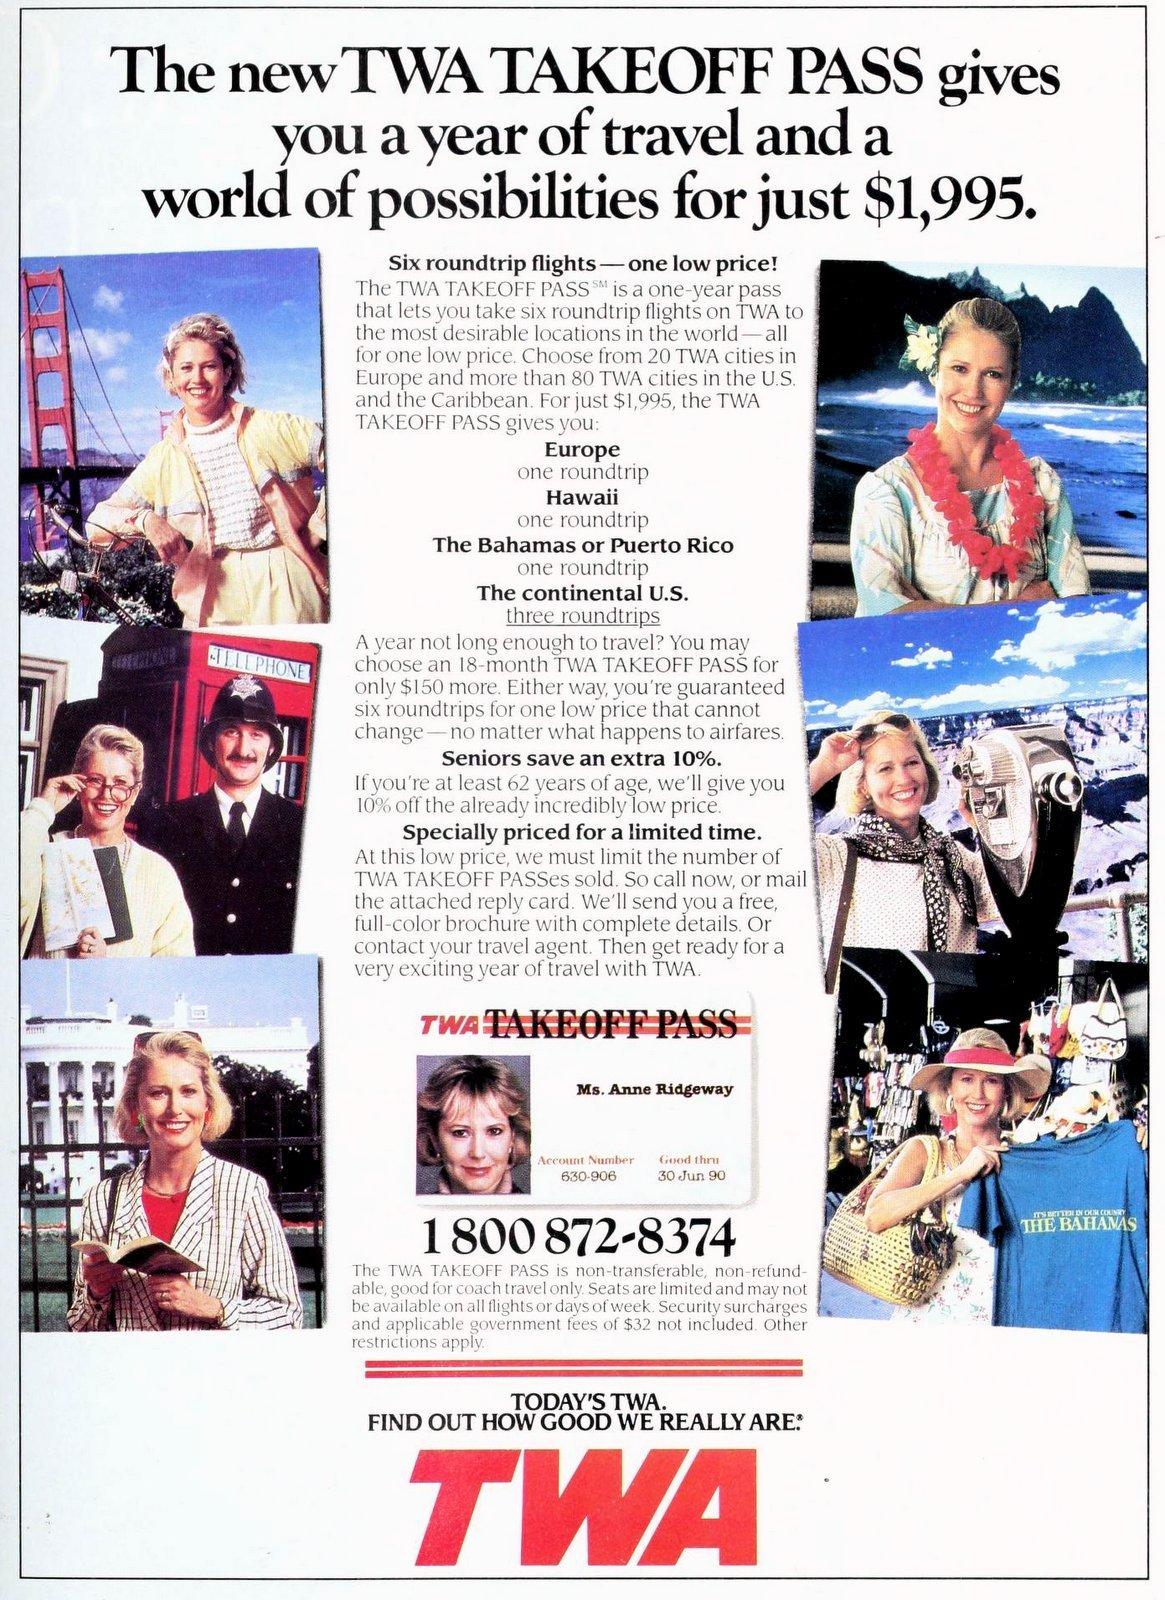 TWA - Airline Takeoff Pass (1989)